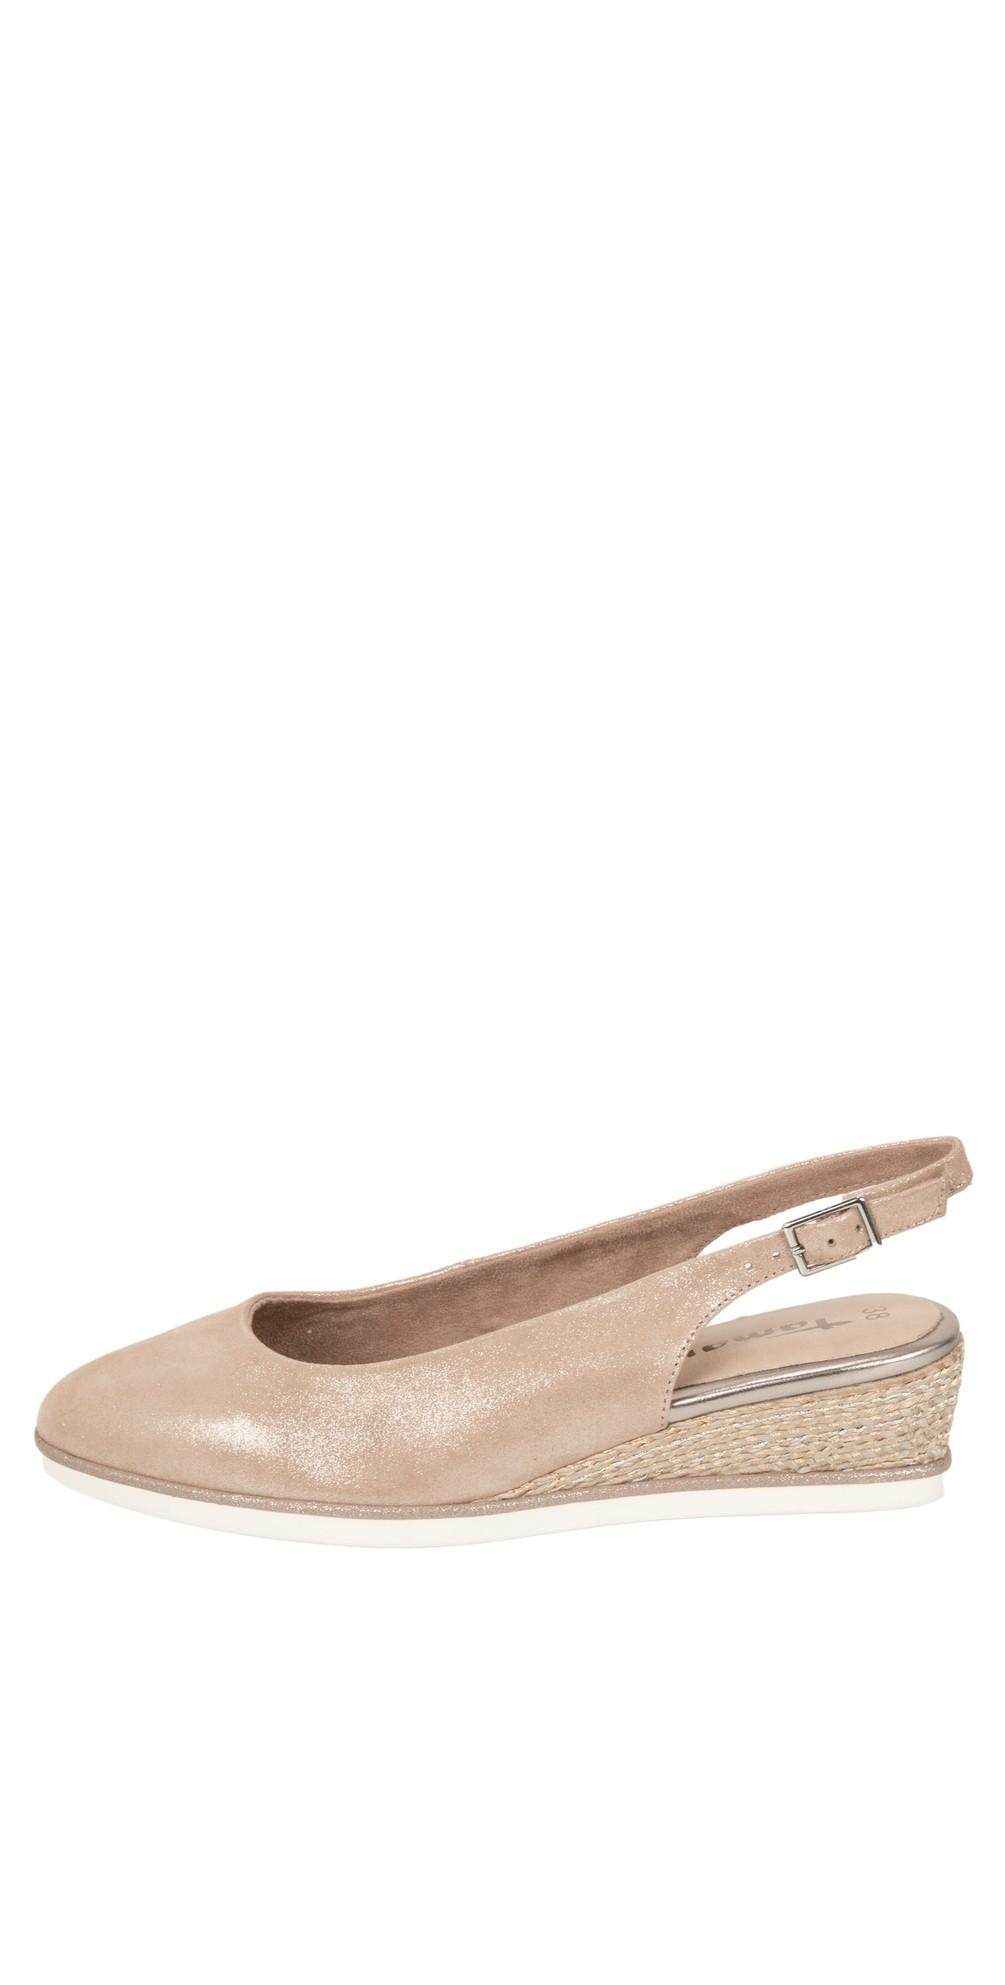 Sanja Wedge Shoe main image